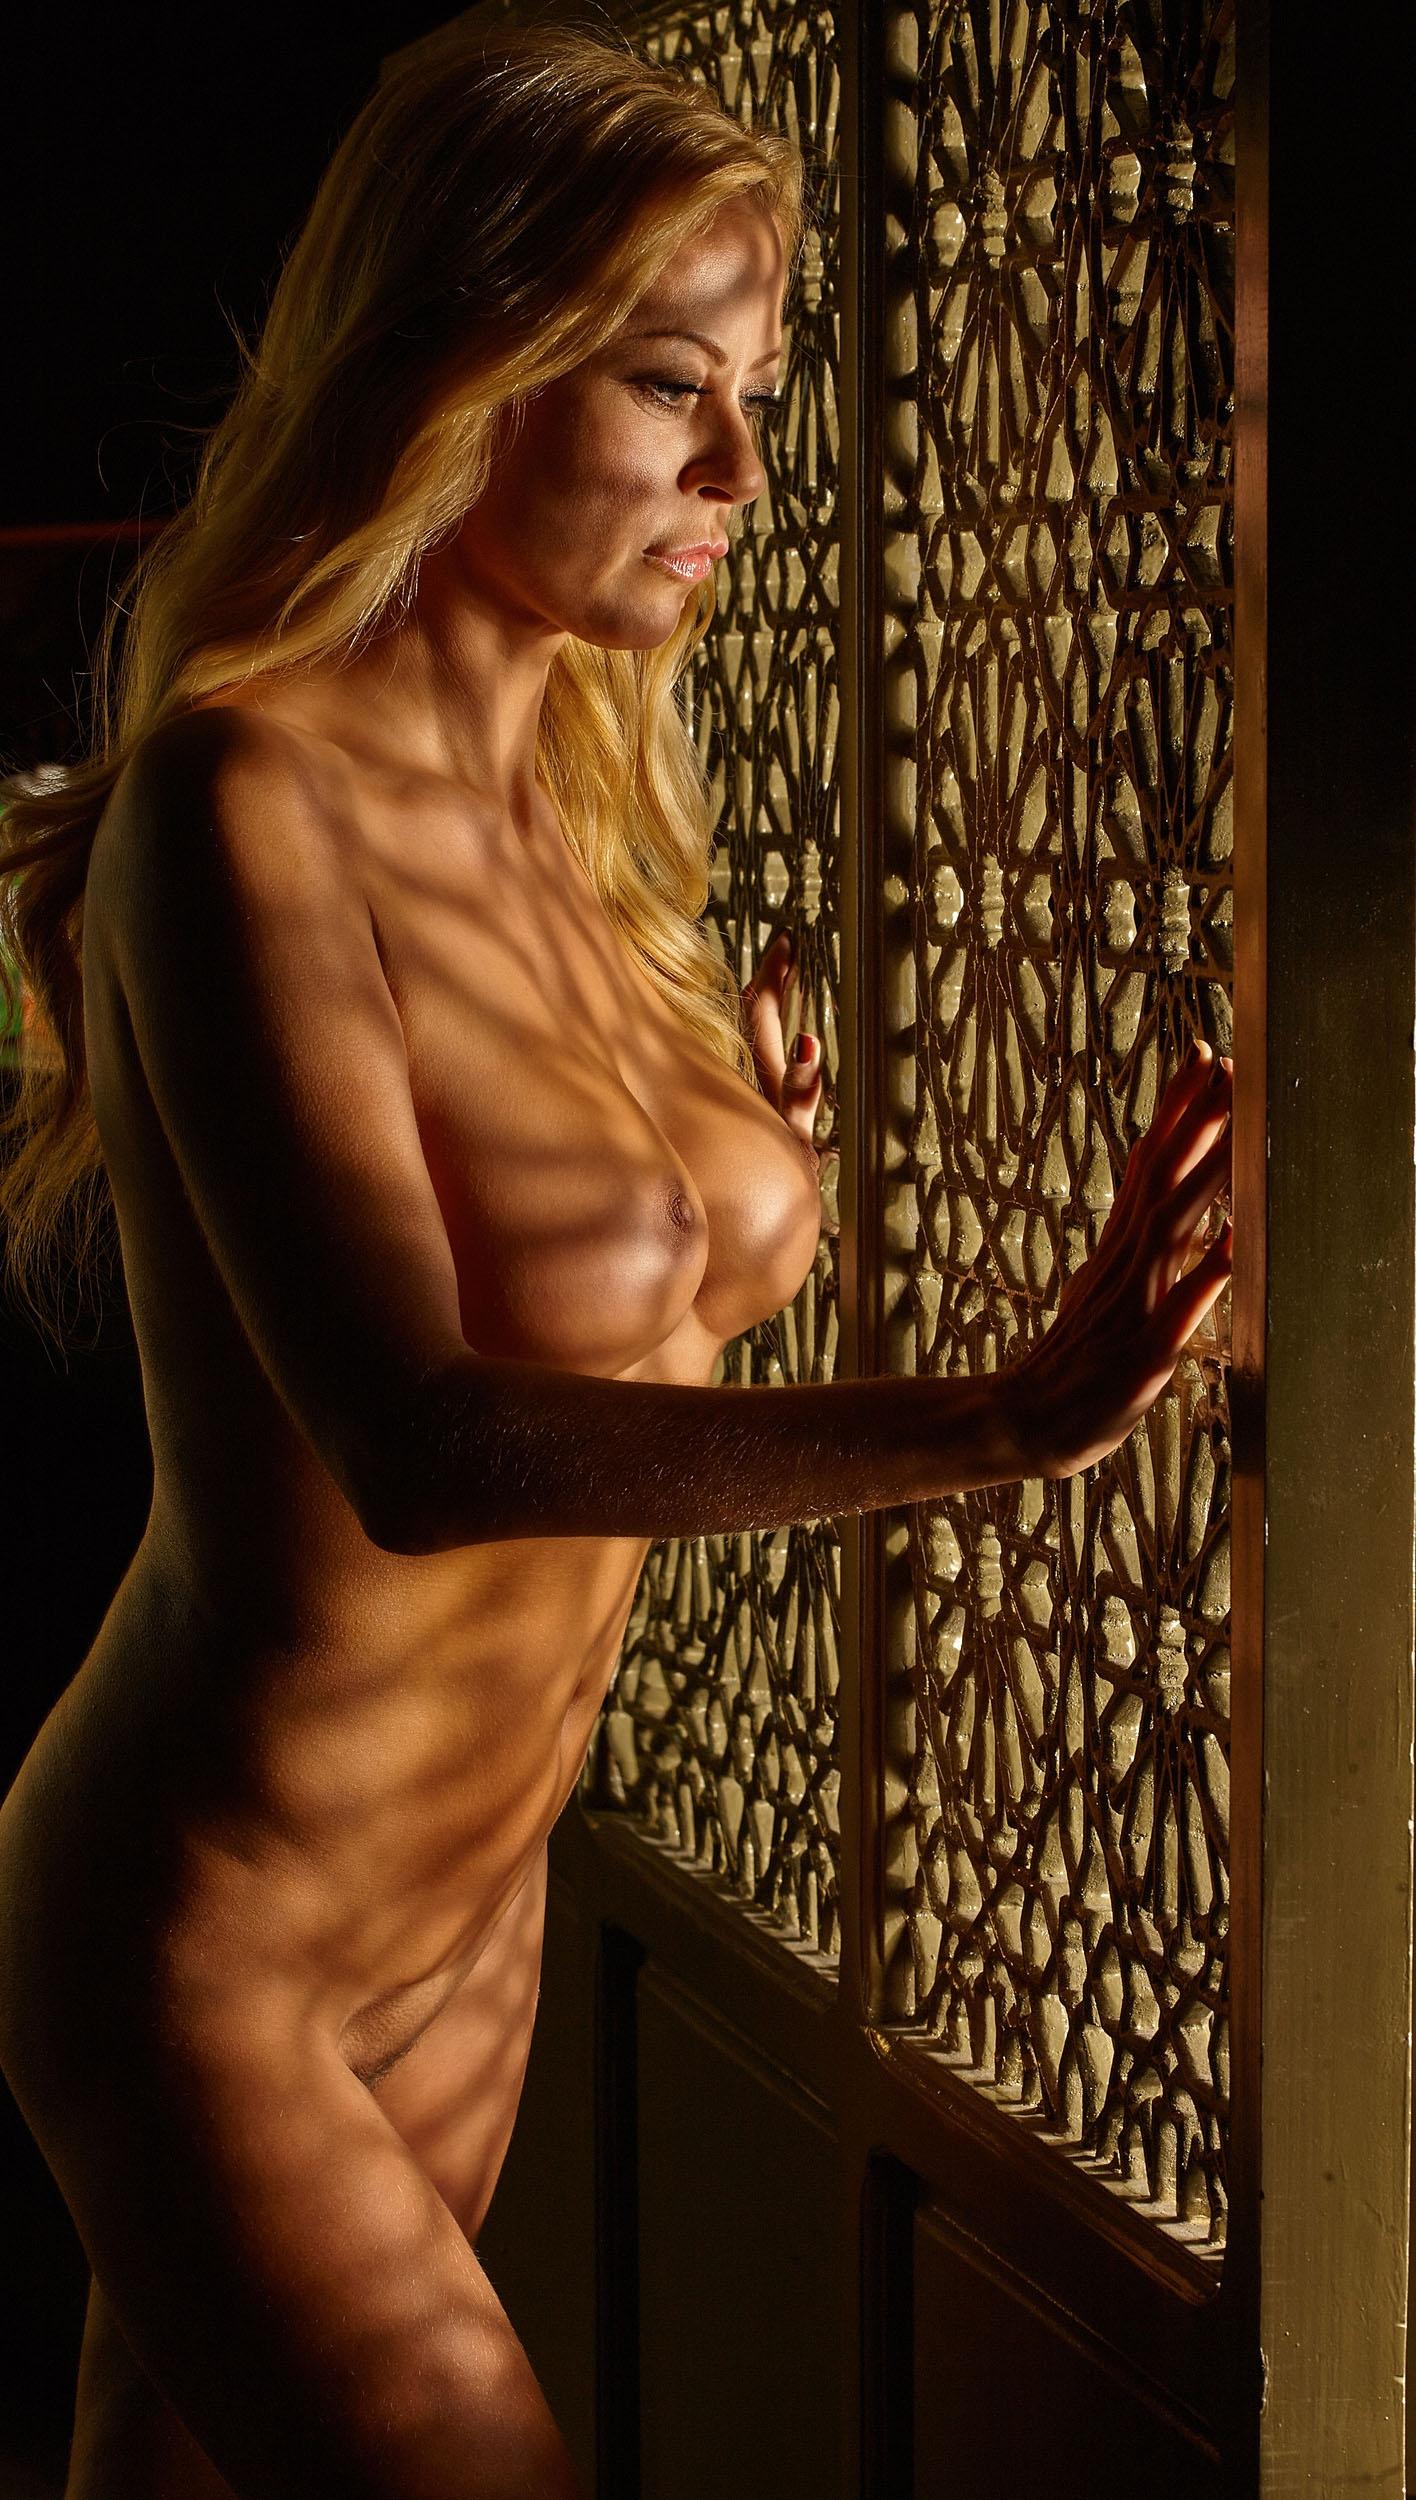 Дженни Элверс голая. Фото - 48